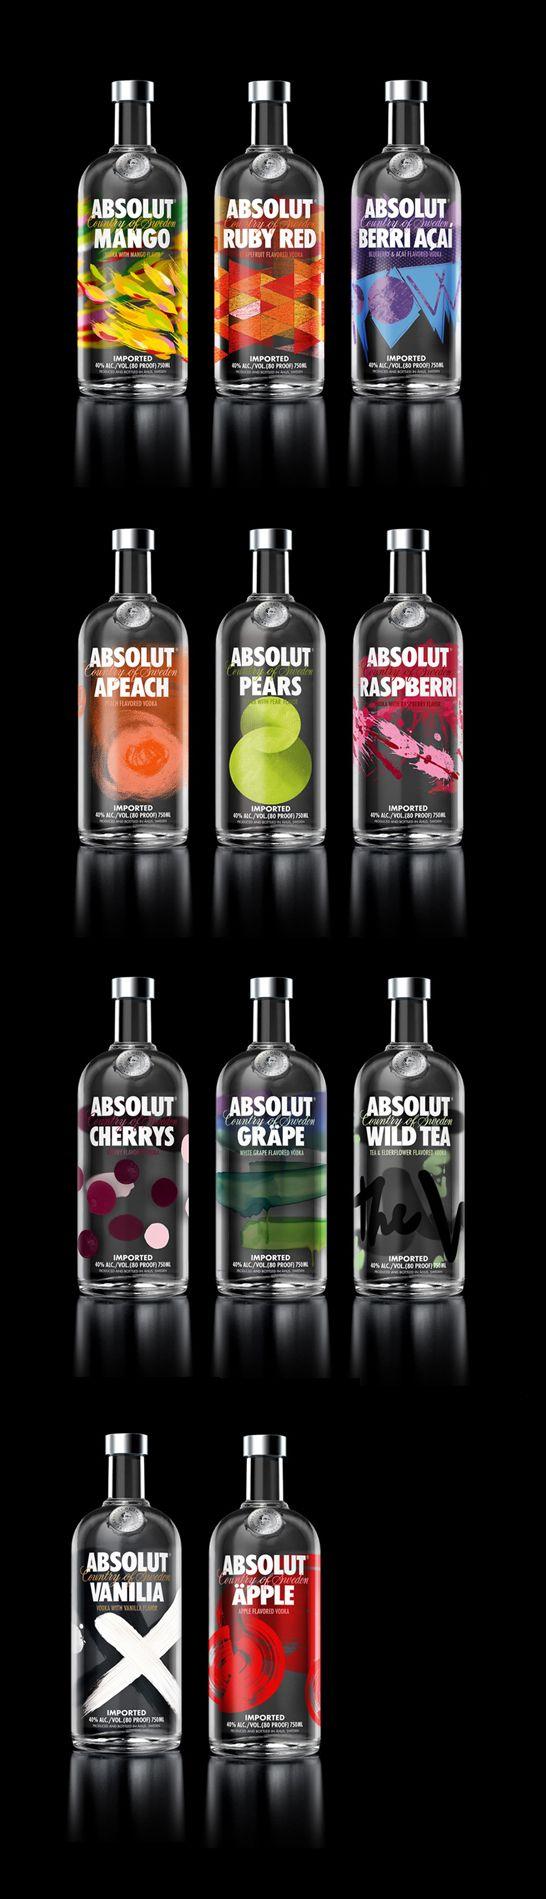 {Absolut} New Absolut Vodka designs - 2013 #Absolut #vodka  + Different Design for flavours